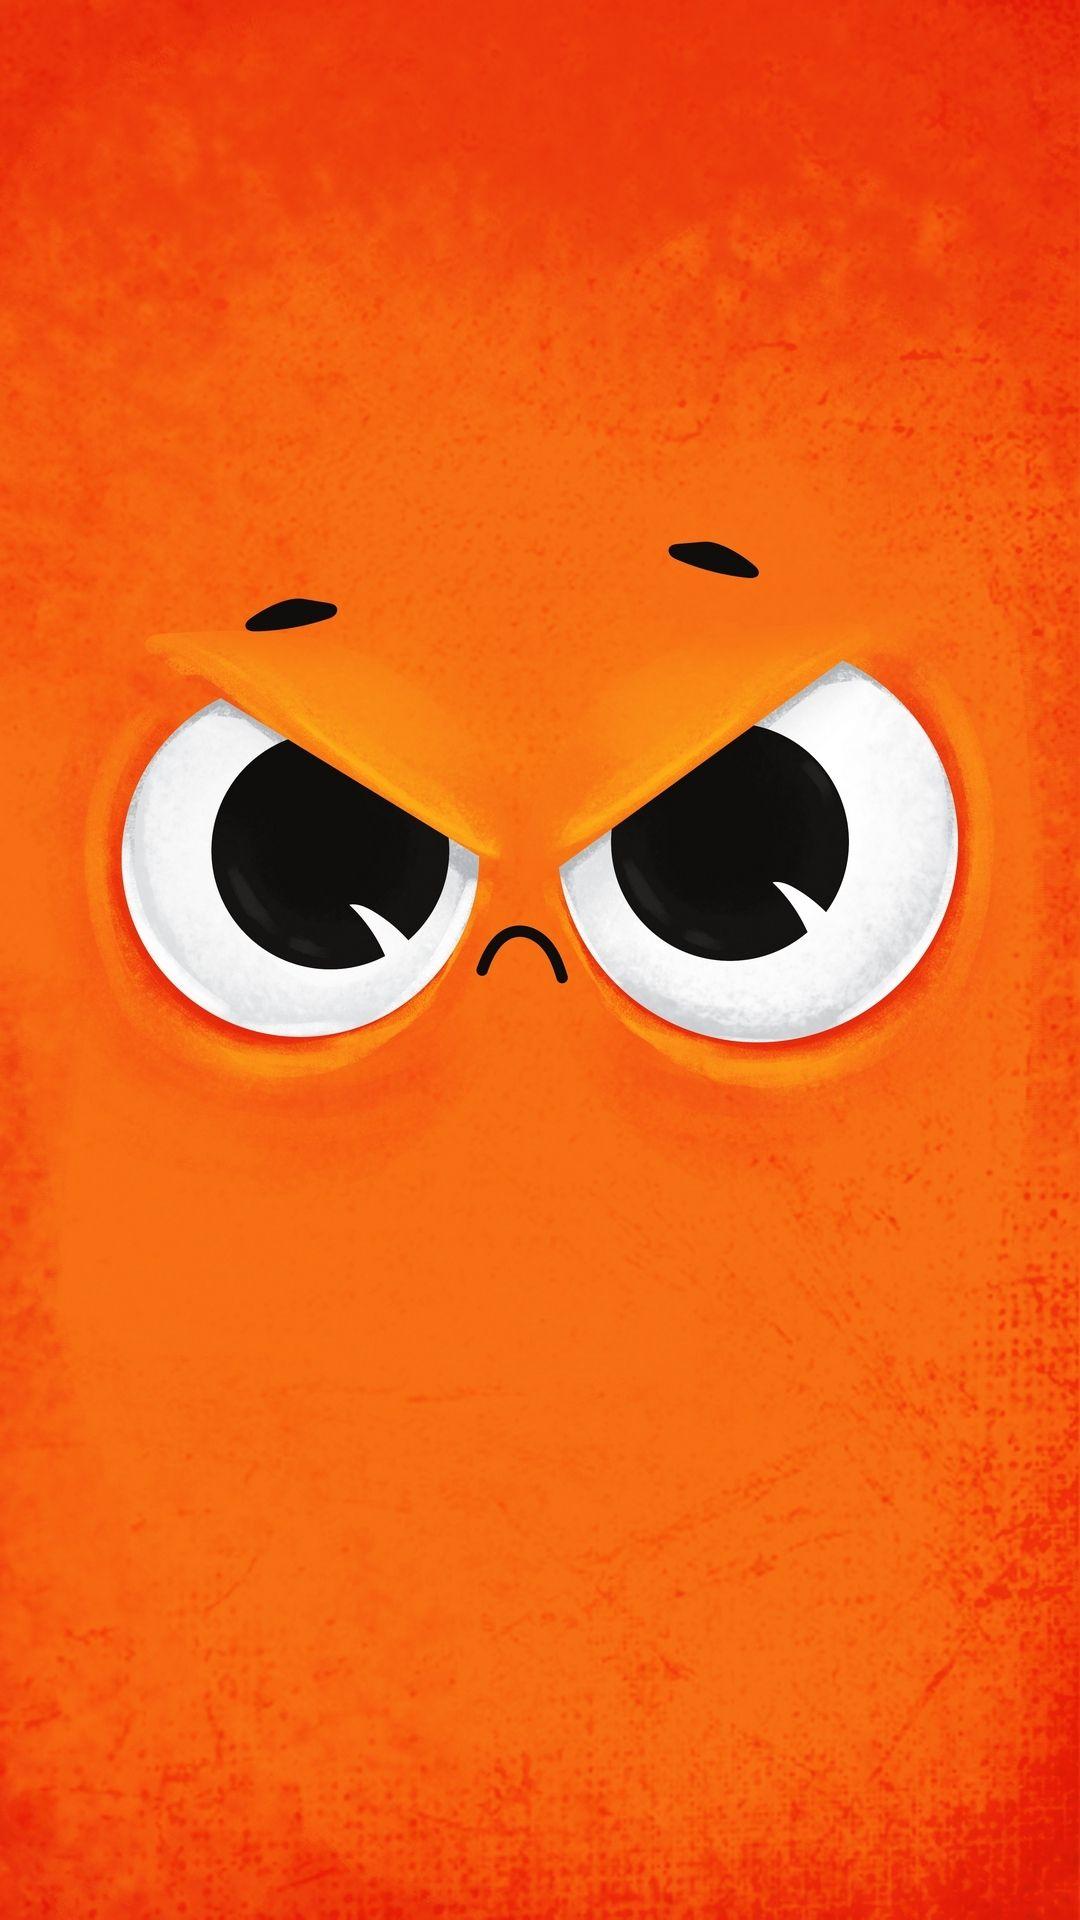 Angry Orange Wallpaper Cartoon Wallpaper Cartoon Wallpaper Hd Angry Wallpapers